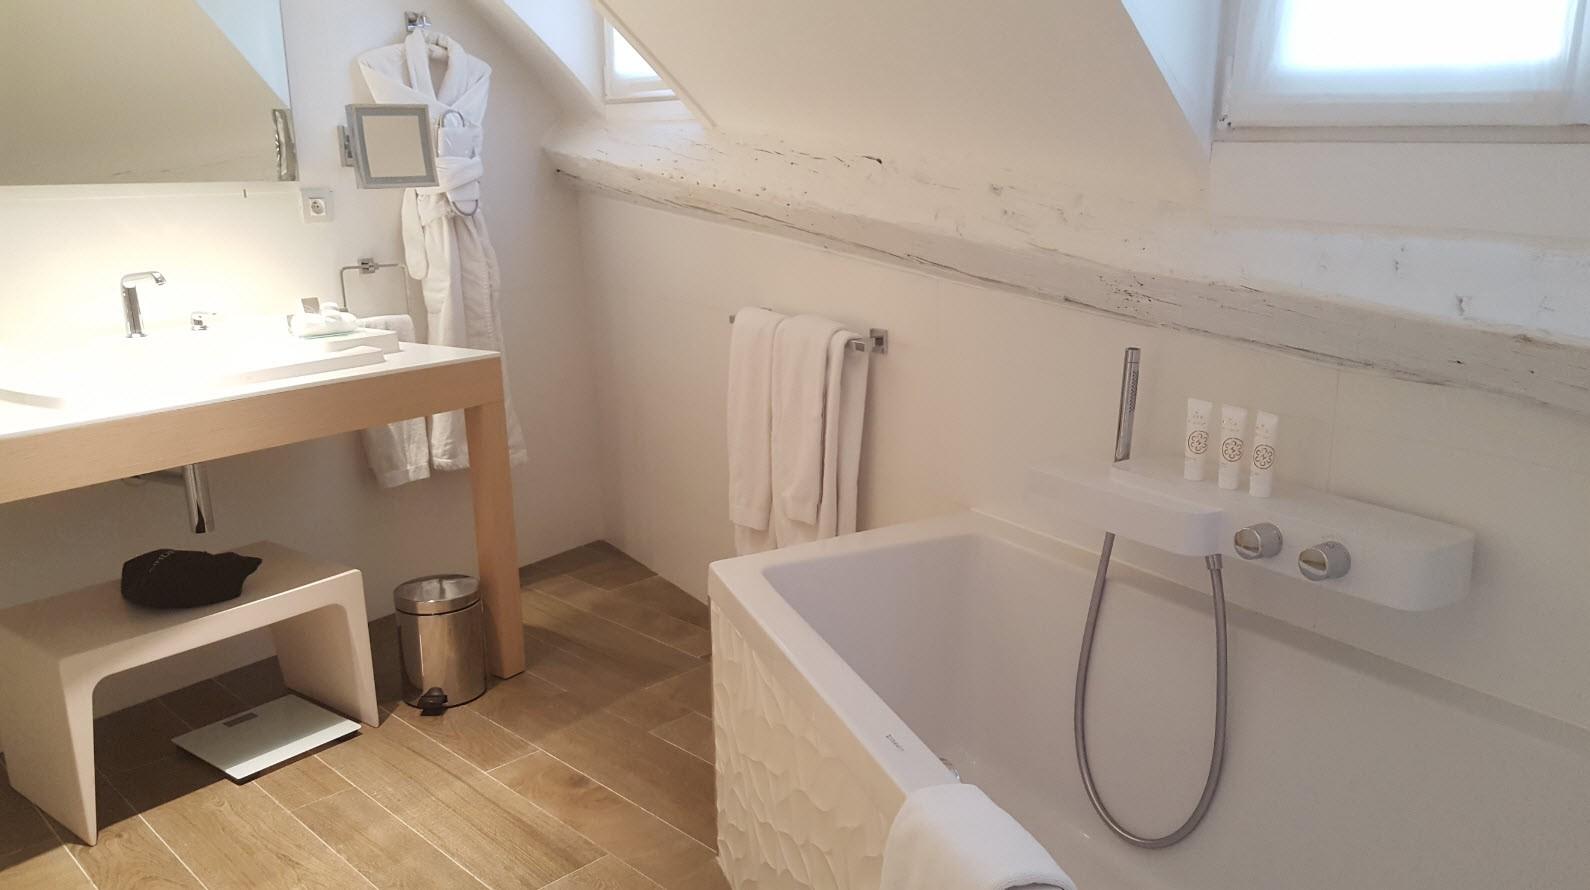 Fournisseur hotellerie salle de bain - Fournisseur salle de bain ...